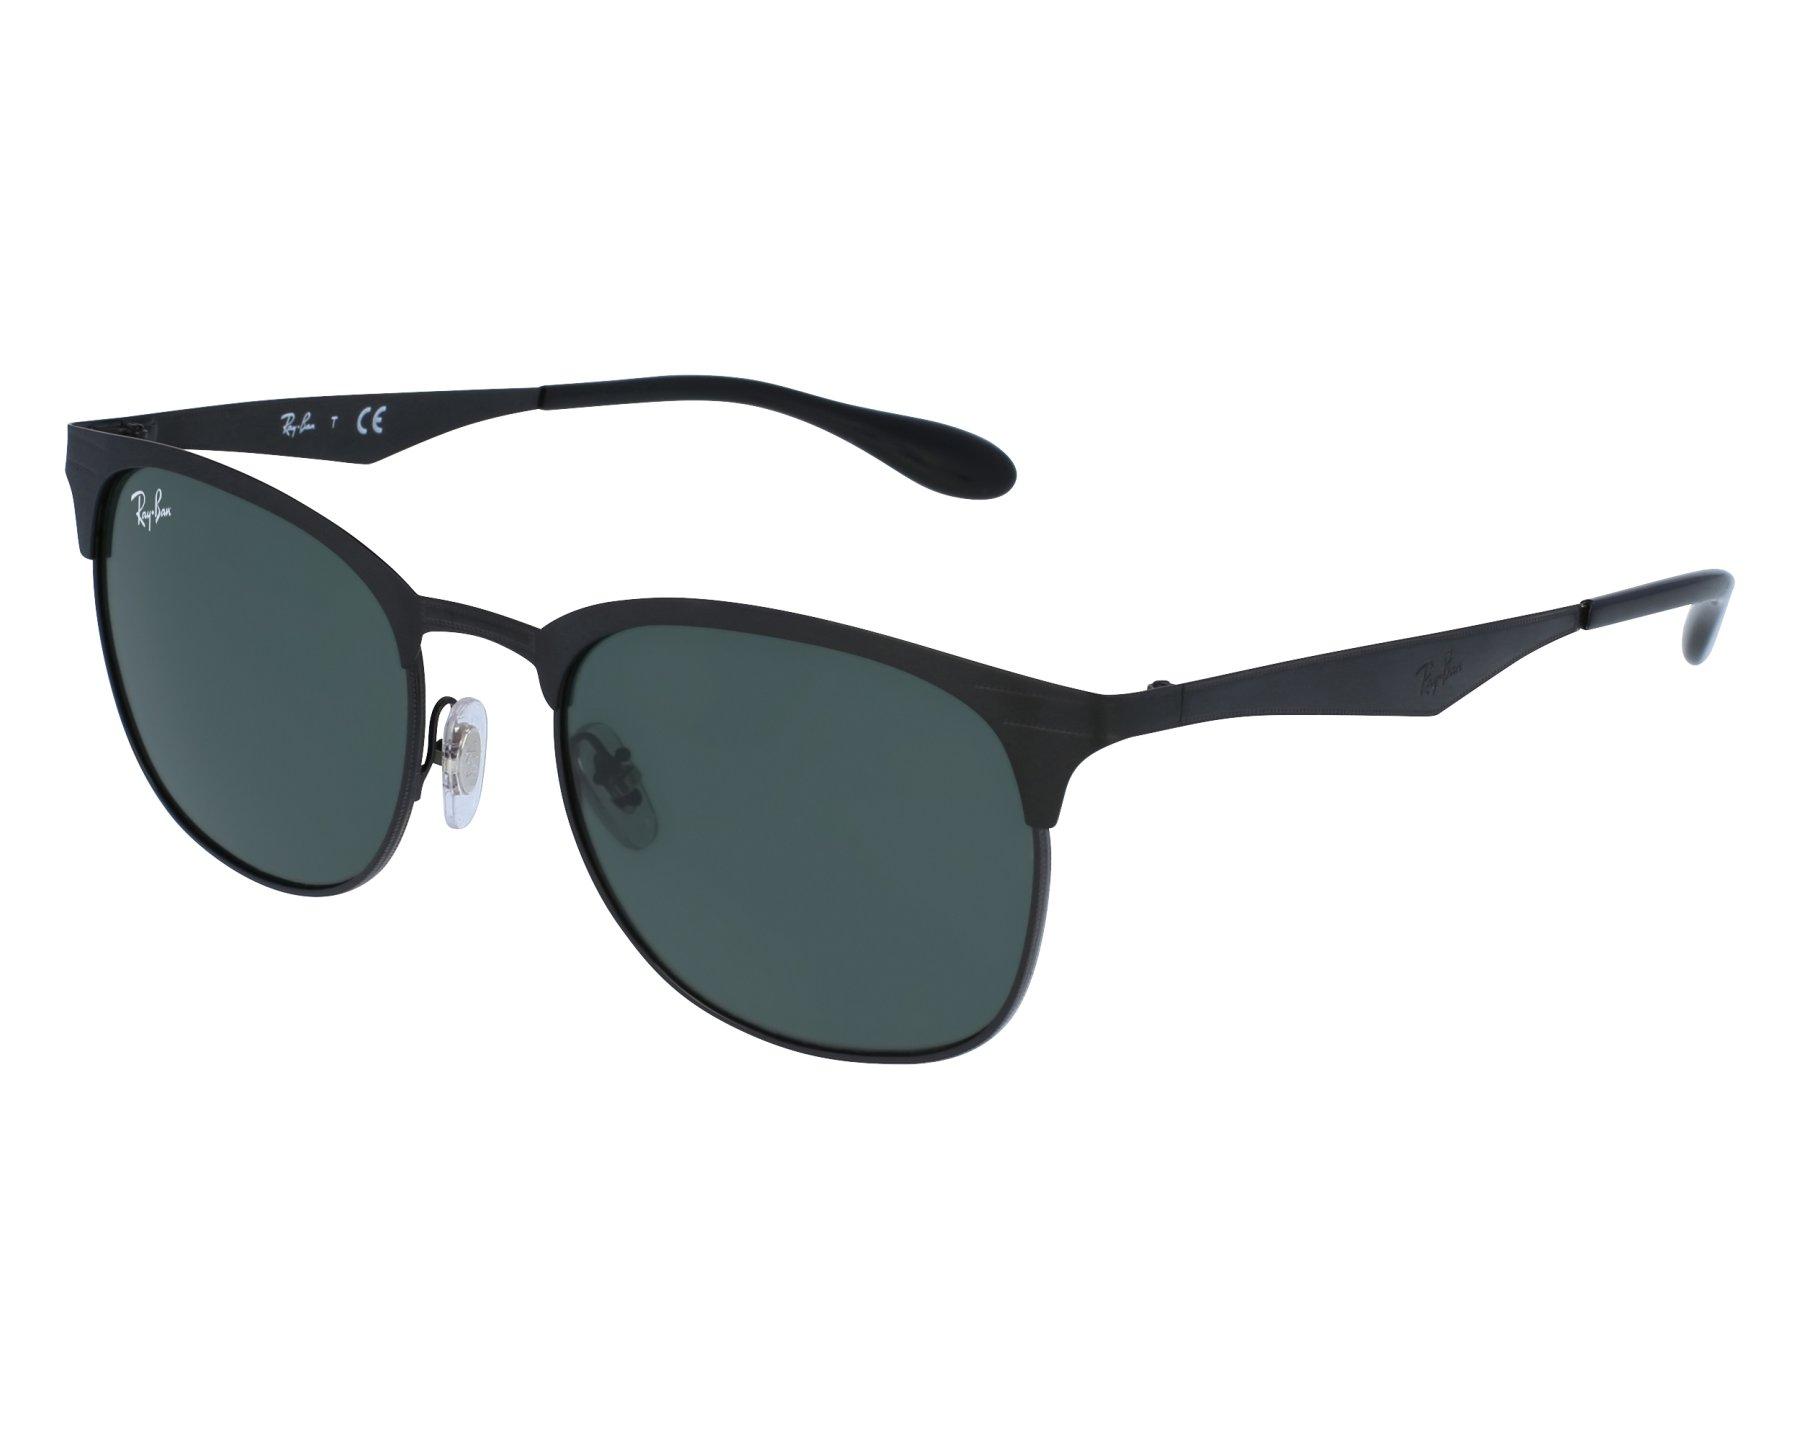 501c9c1a62e Sunglasses Ray-Ban RB-3538 186 71 53-19 Black Black front